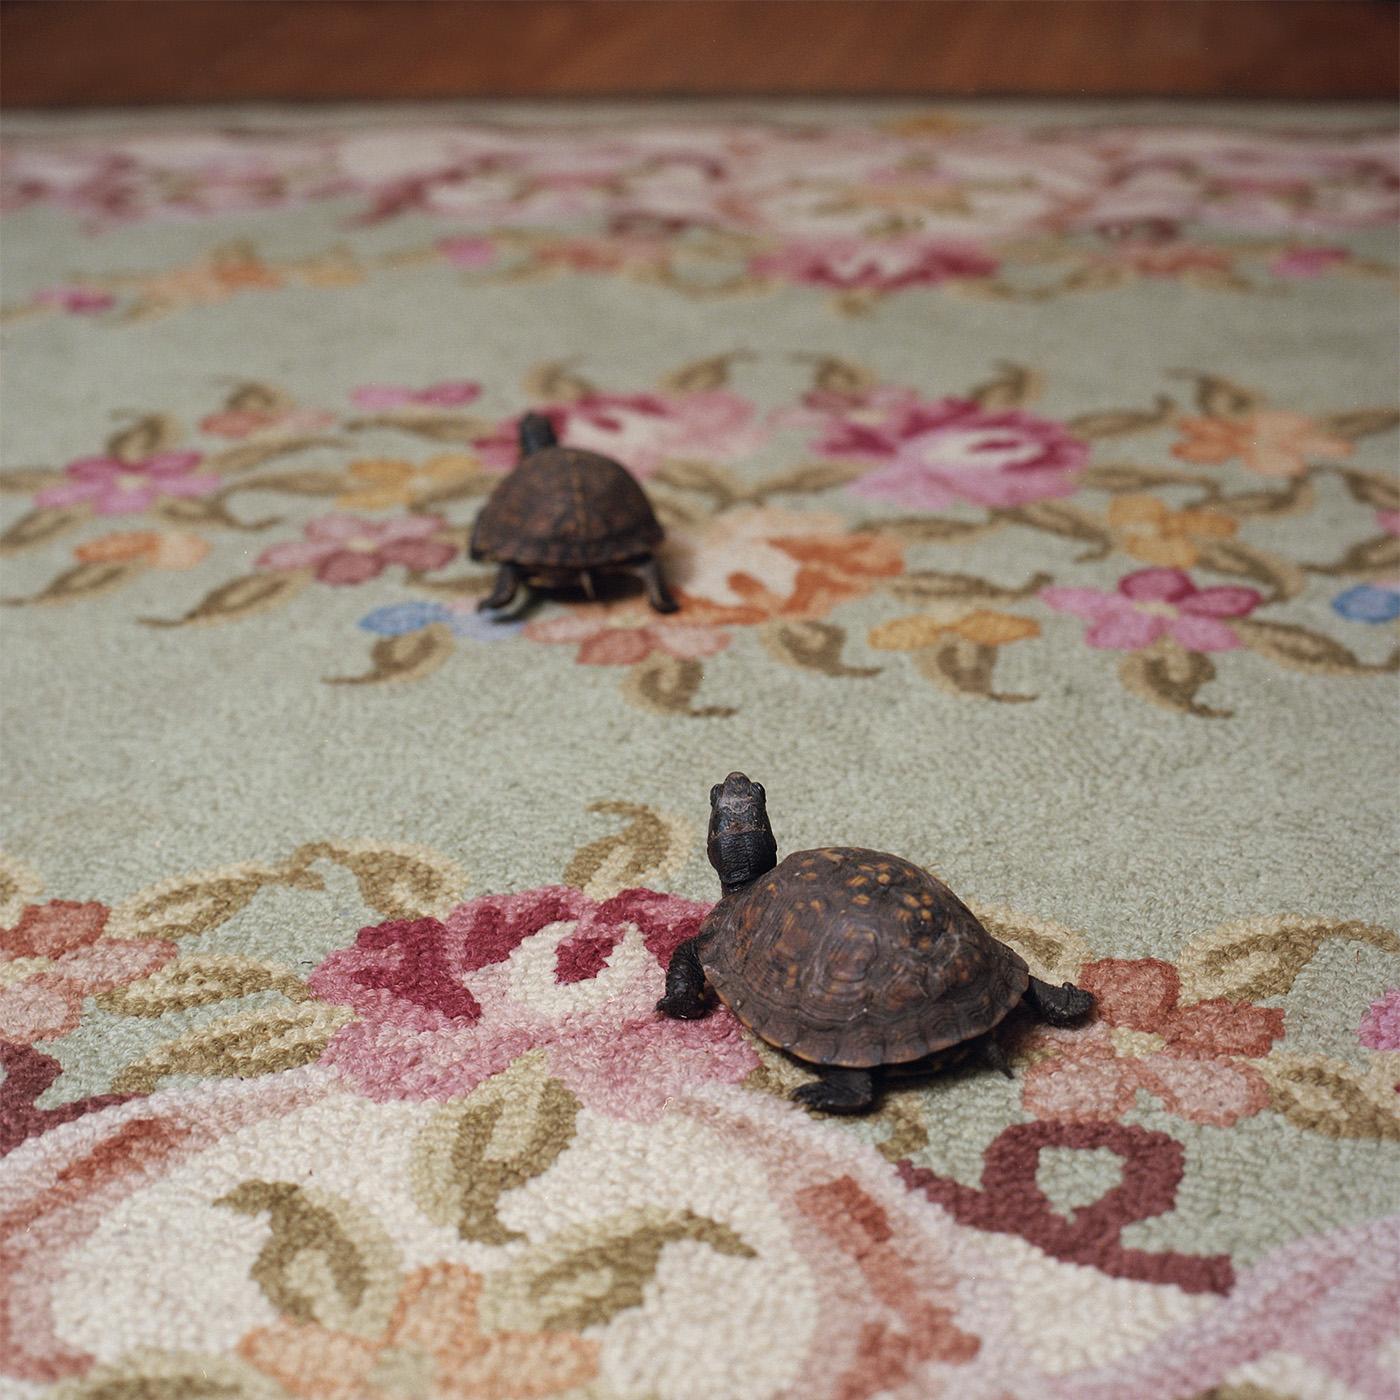 Eastern Box Turtles